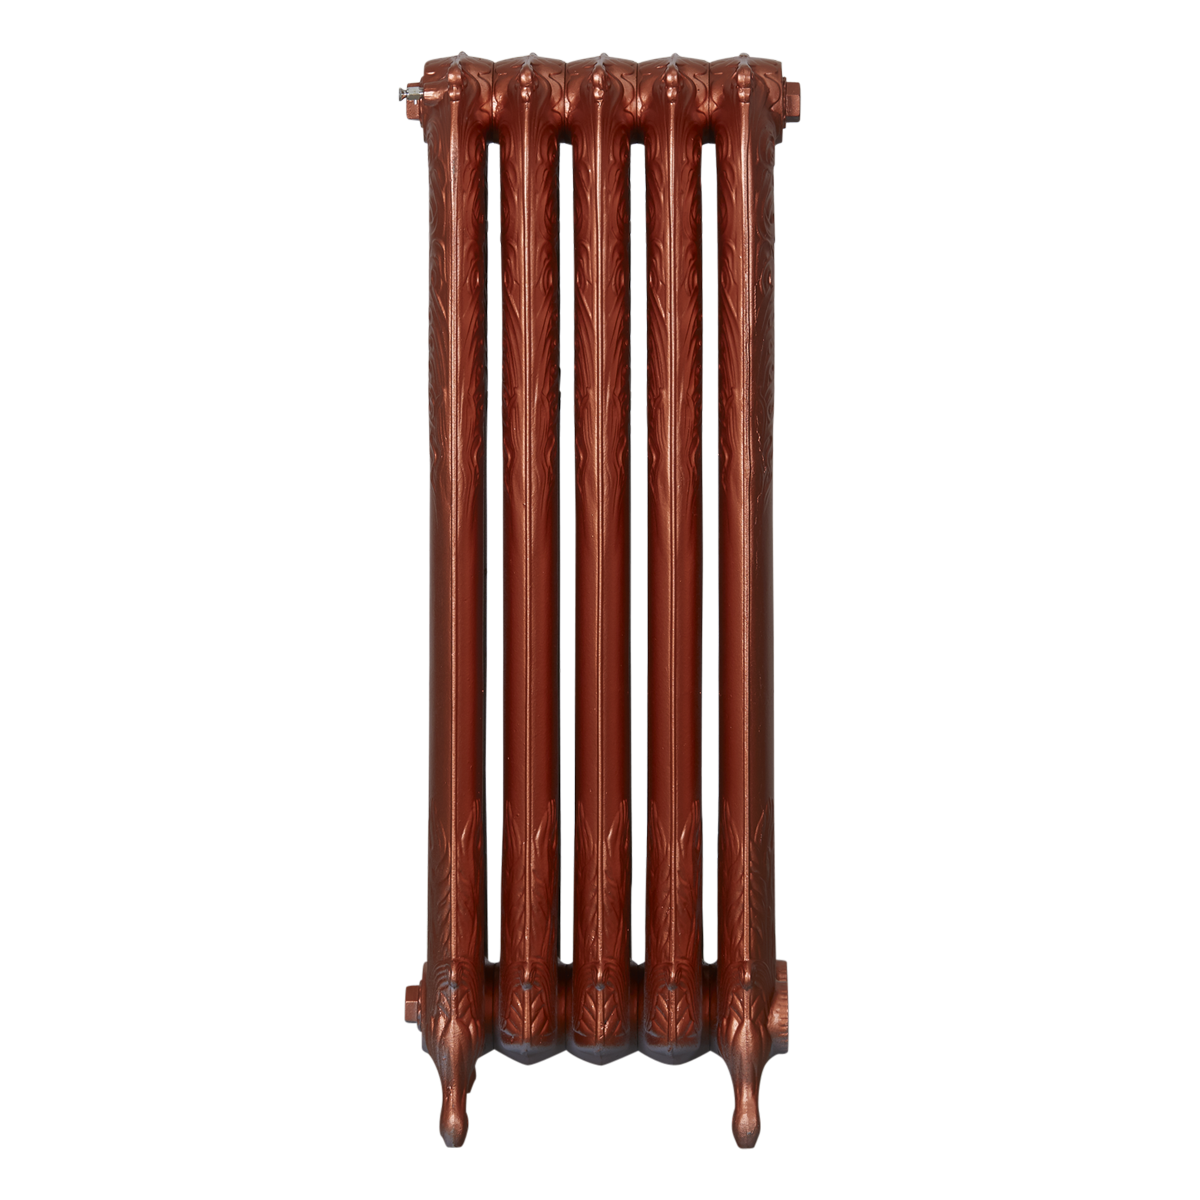 Ironworks Radiators Inc. refurbished cast iron radiator Batawa in Copper Metallic